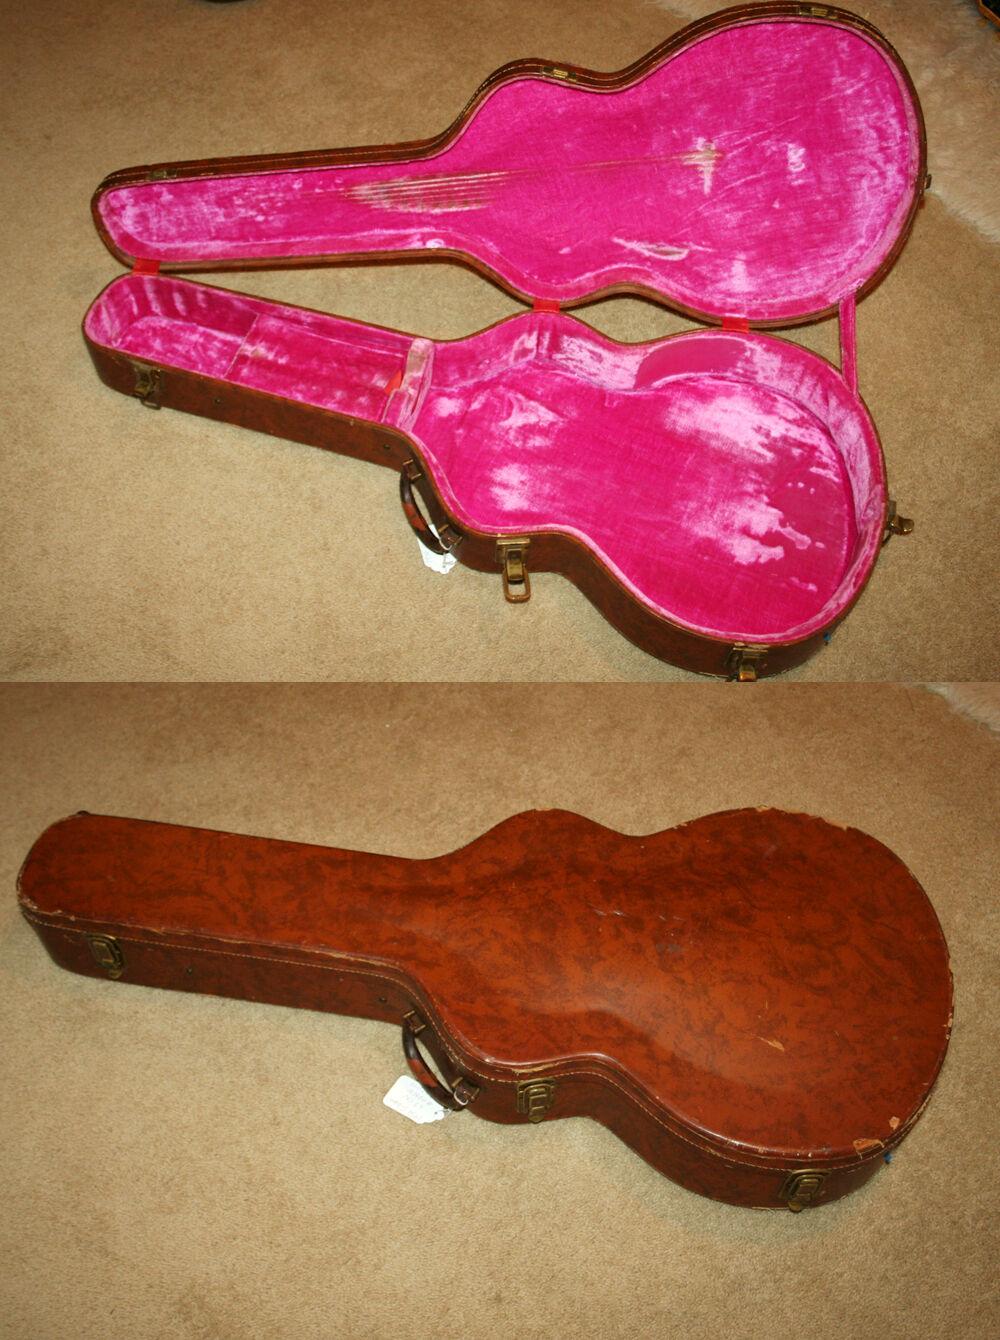 1956 Gibson L7 NC Vintage Archtop Acoustic Guitar (gat0119 (gat0119 (gat0119 L-7) cd29ff